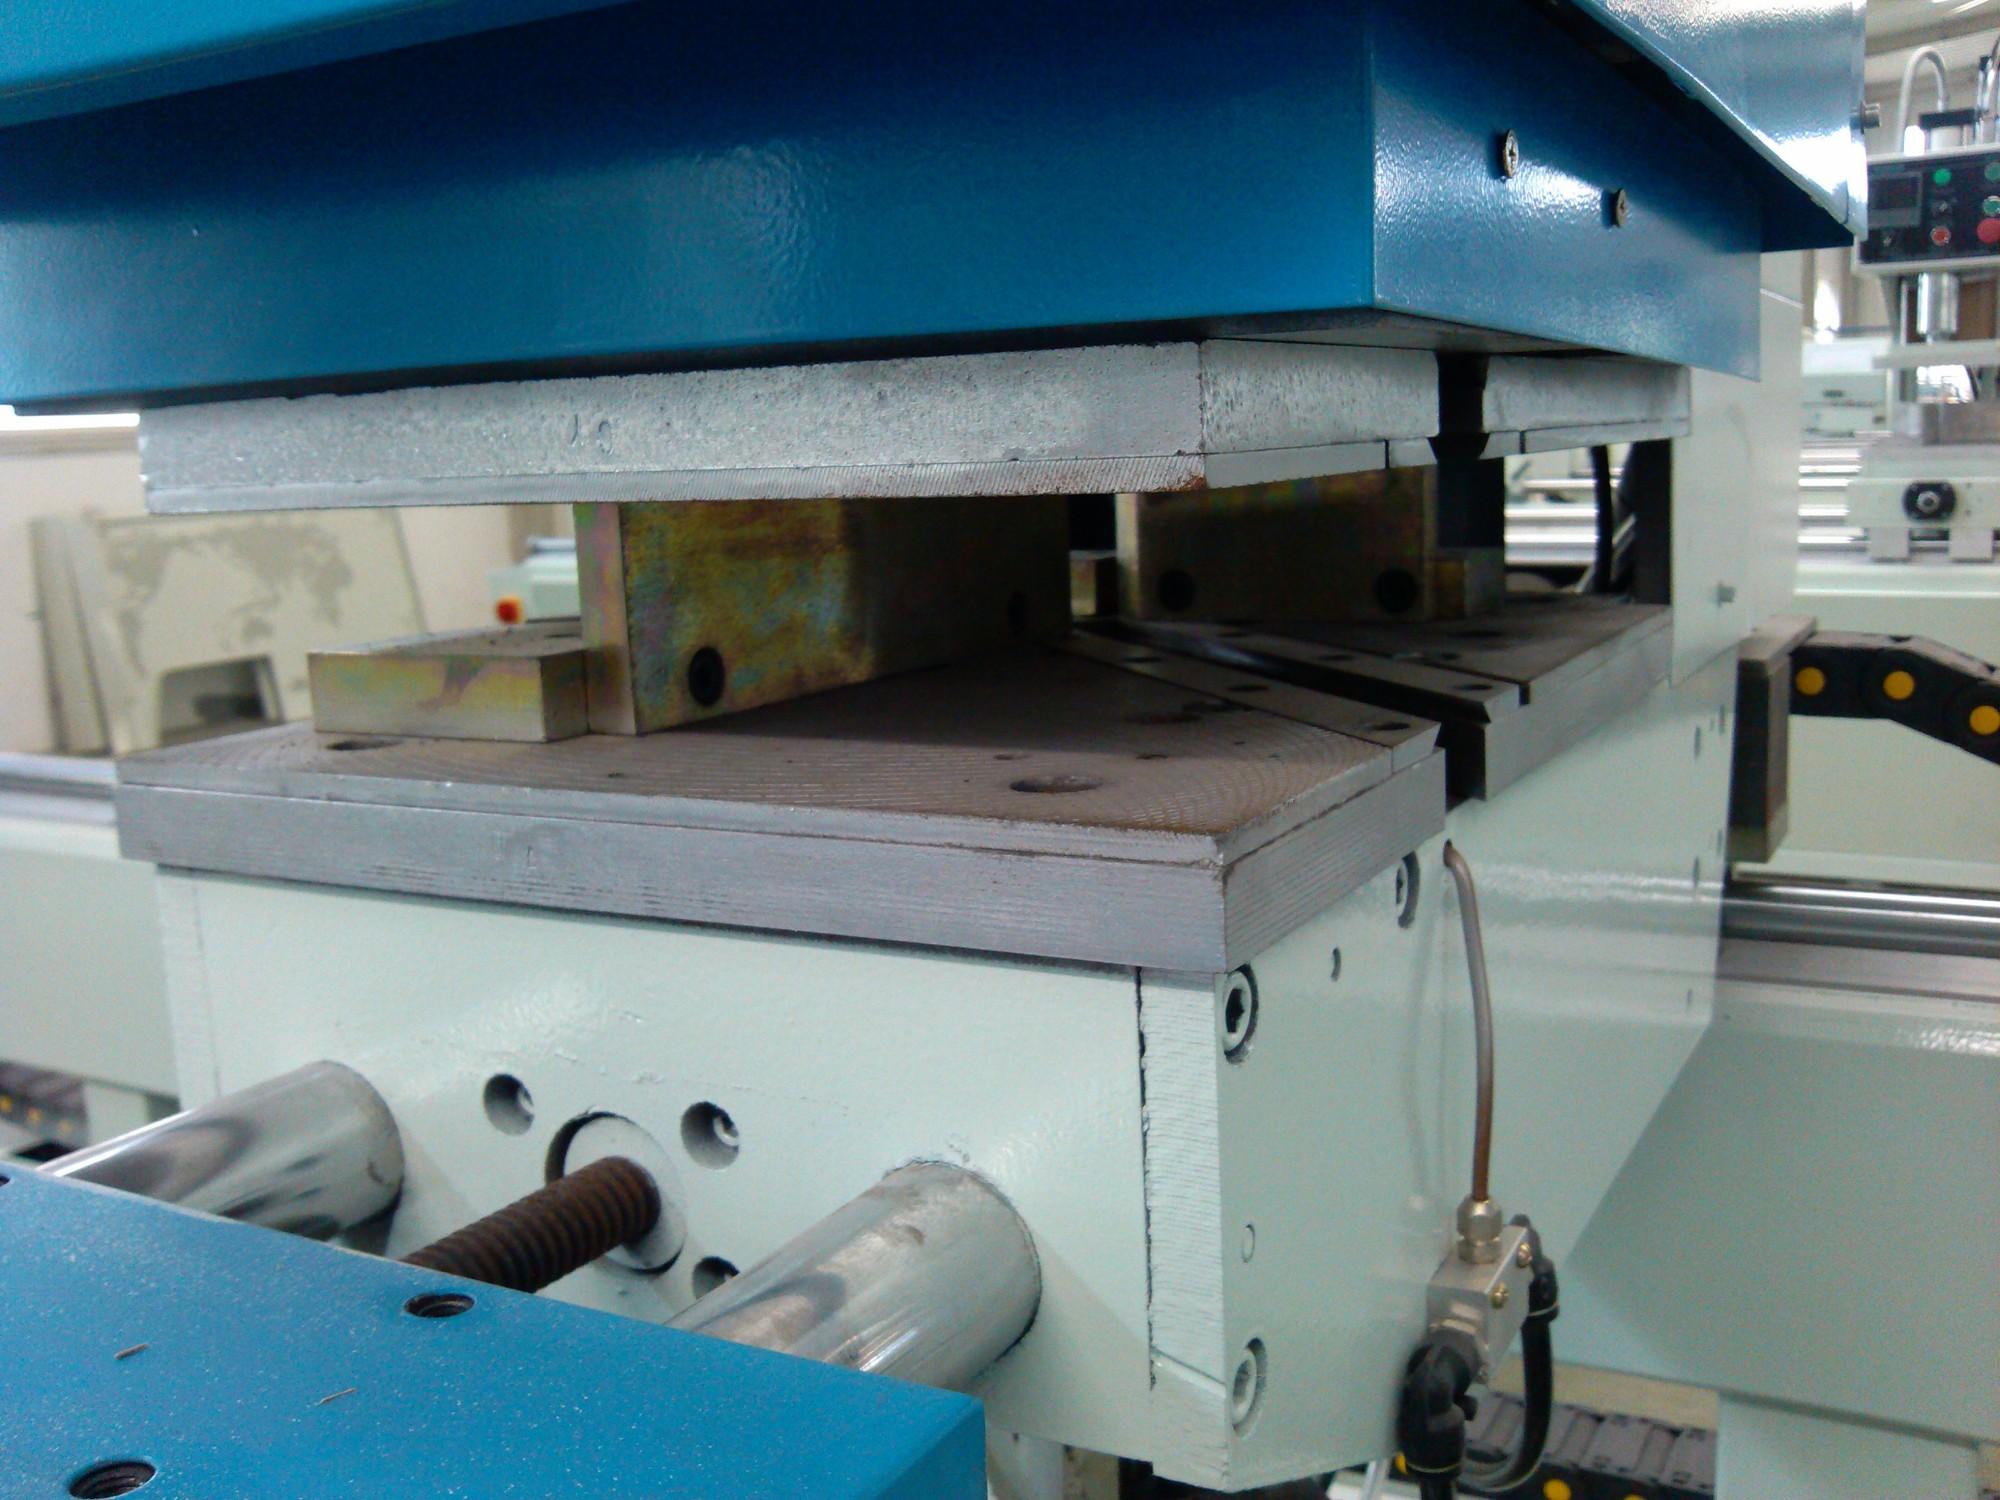 High quality PVC Seamless Three Head Welding Machine Quotes,China PVC Seamless Three Head Welding Machine Factory,PVC Seamless Three Head Welding Machine Purchasing